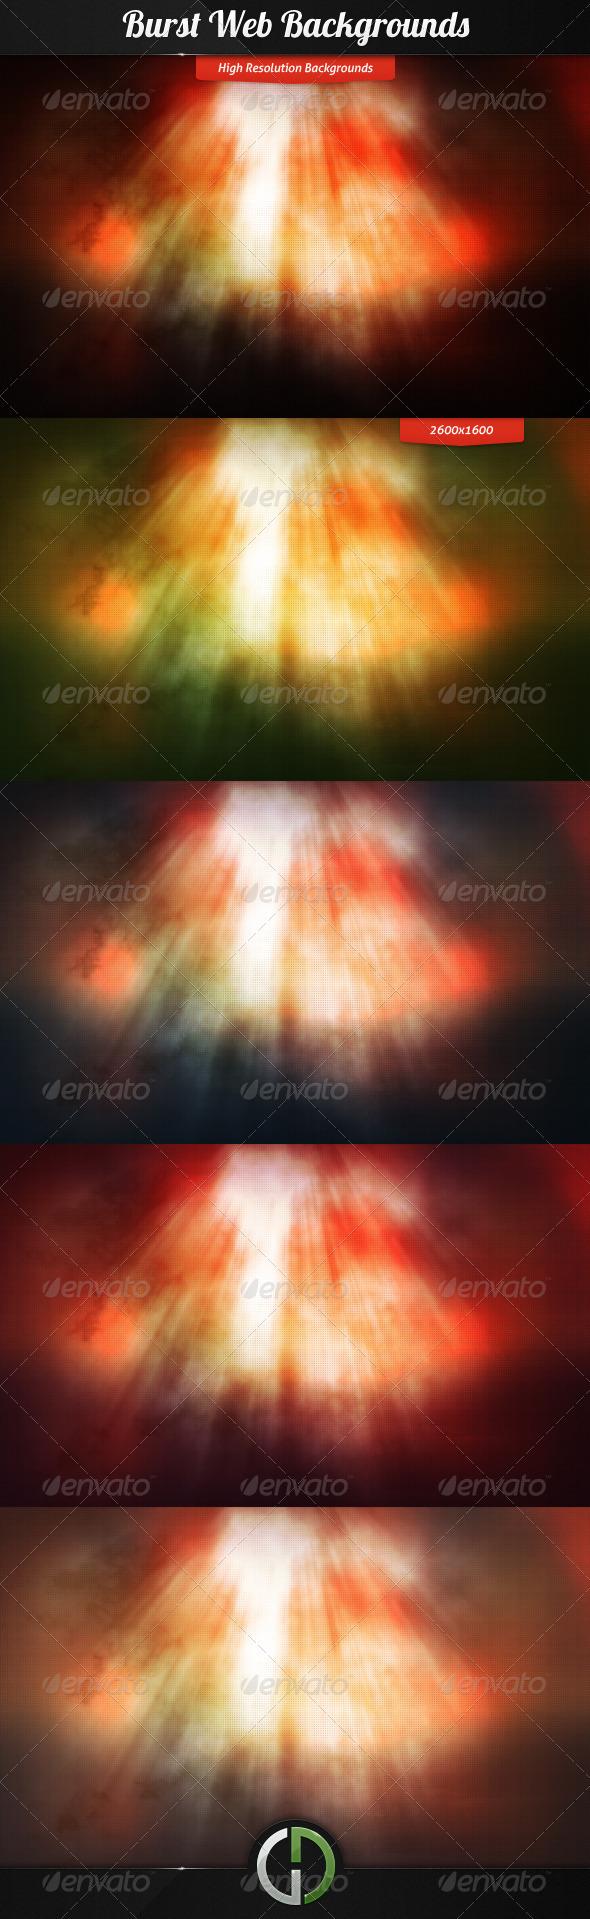 GraphicRiver Burst Web Backgrounds 2070620